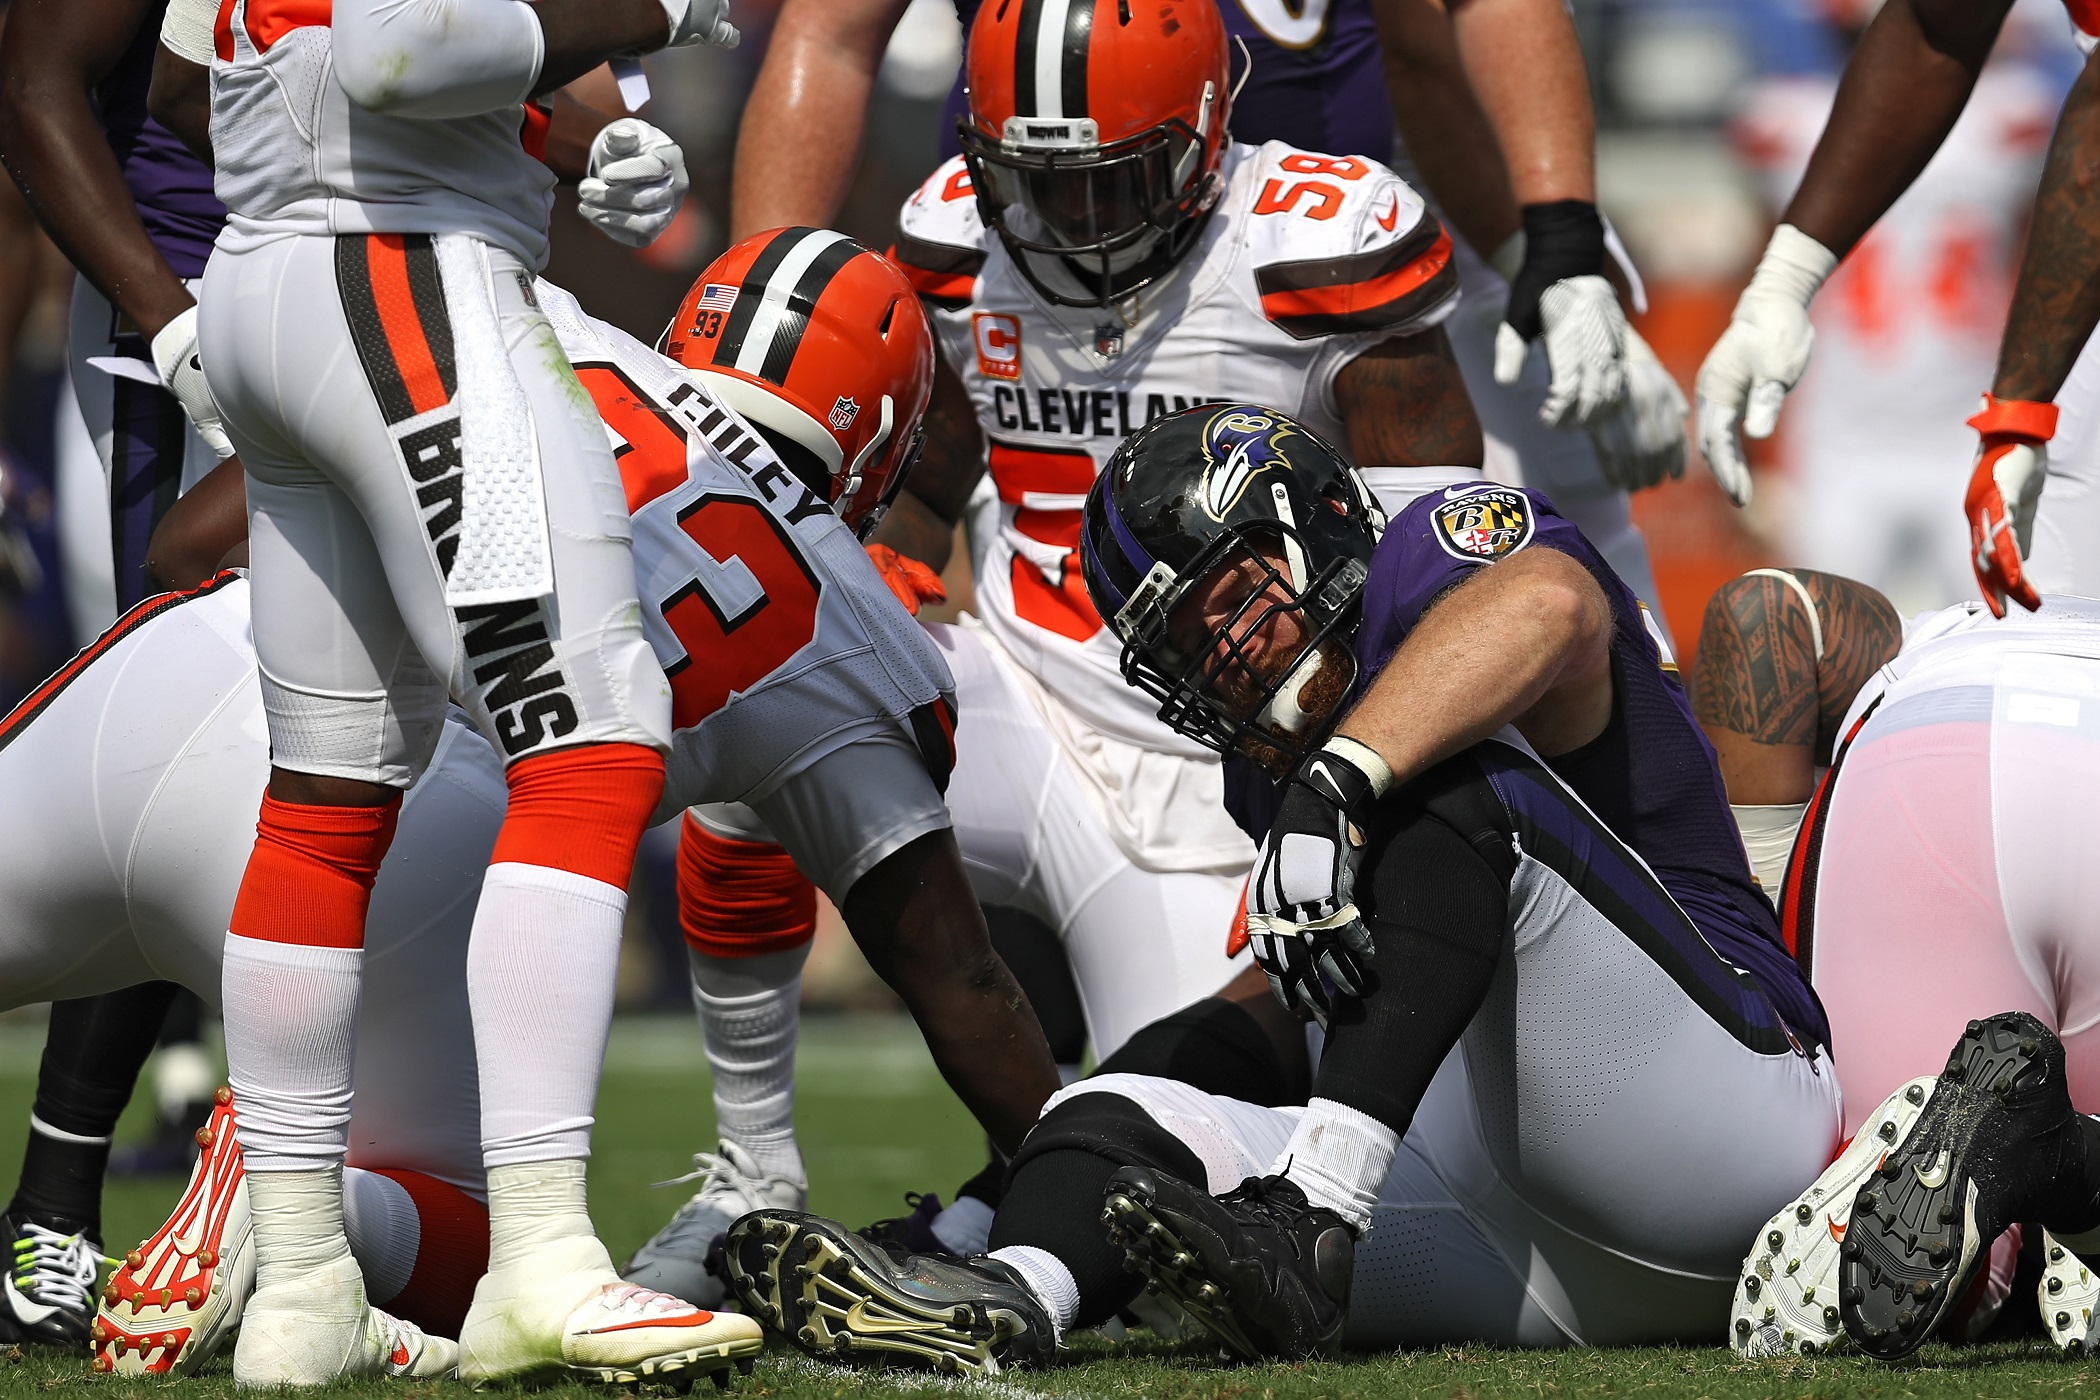 Marshal Yanda Baltimore Ravens RG NFL and PFF stats